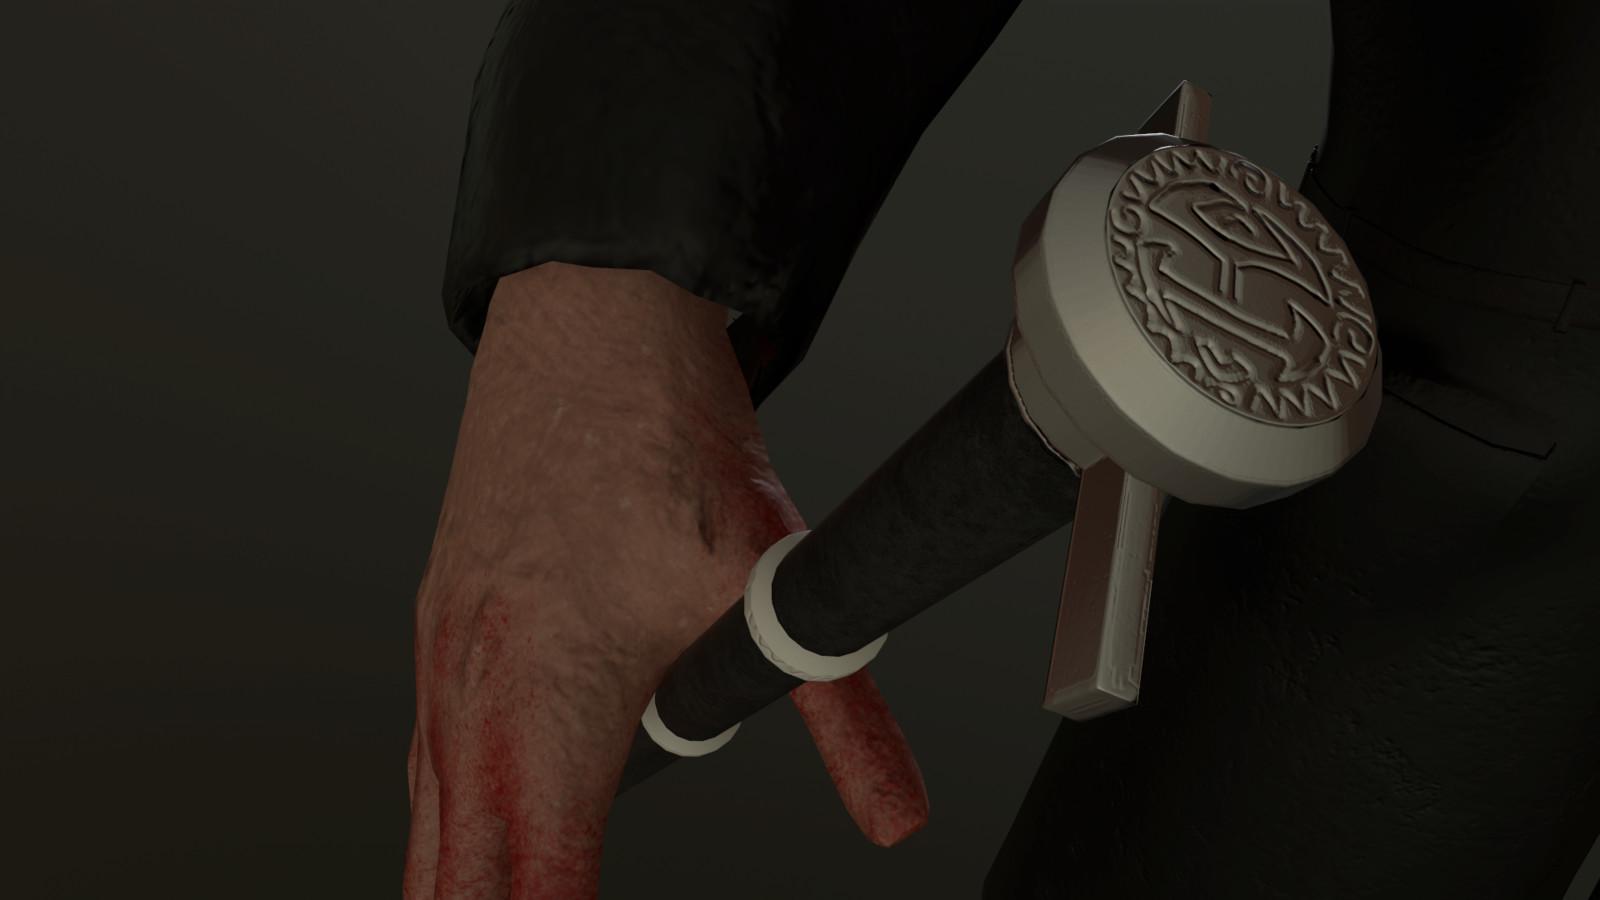 Cane Detail with Rapier Handle